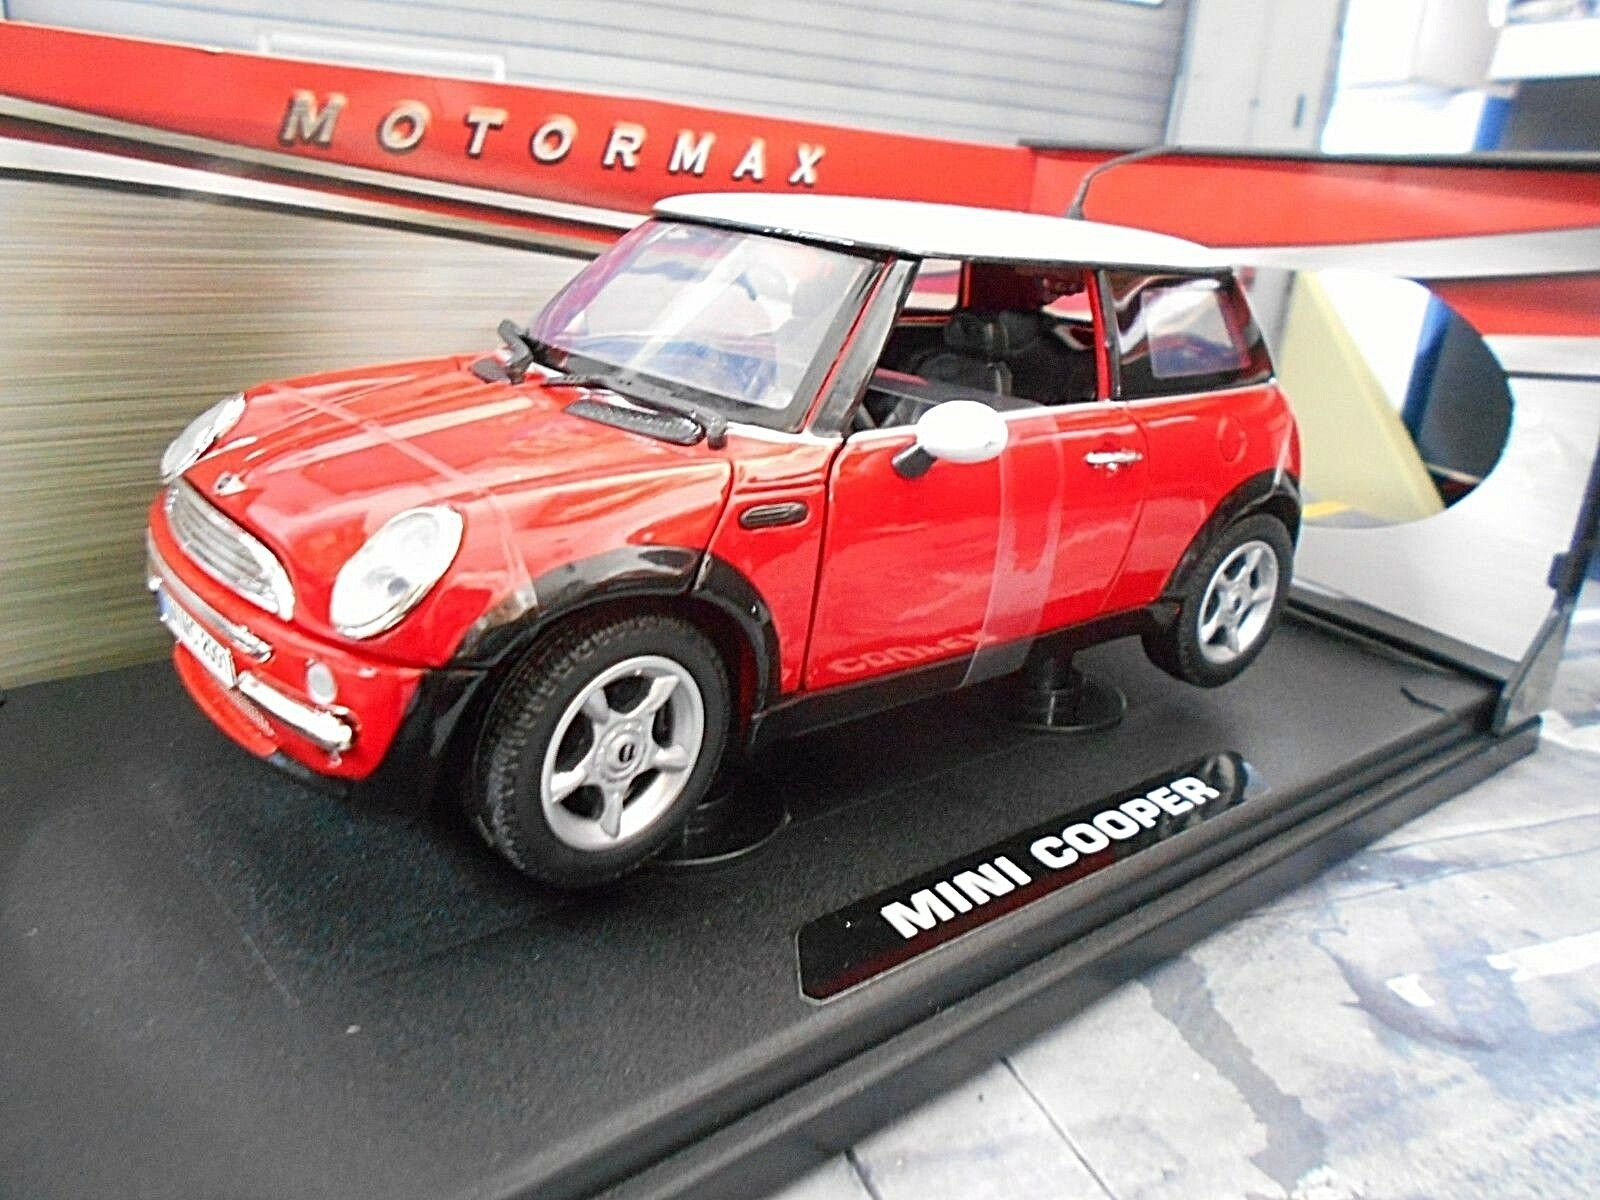 BMW MINI MINI Cooper new 2005 red red  S-Preis Motormax 1 18